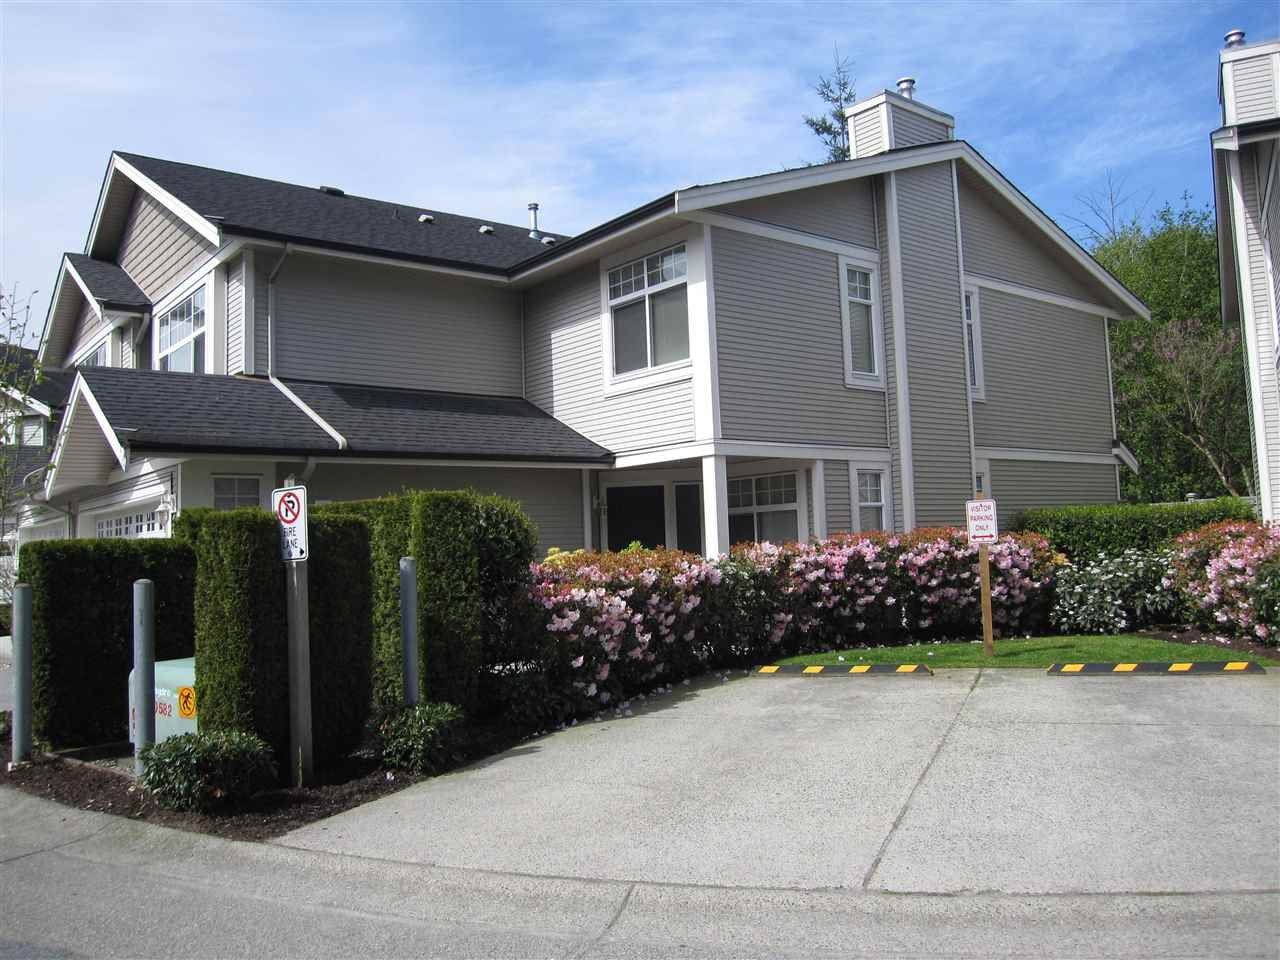 "Photo 2: Photos: 14 23343 KANAKA Way in Maple Ridge: Cottonwood MR Townhouse for sale in ""COTTONWOOD GROVE"" : MLS®# R2164779"